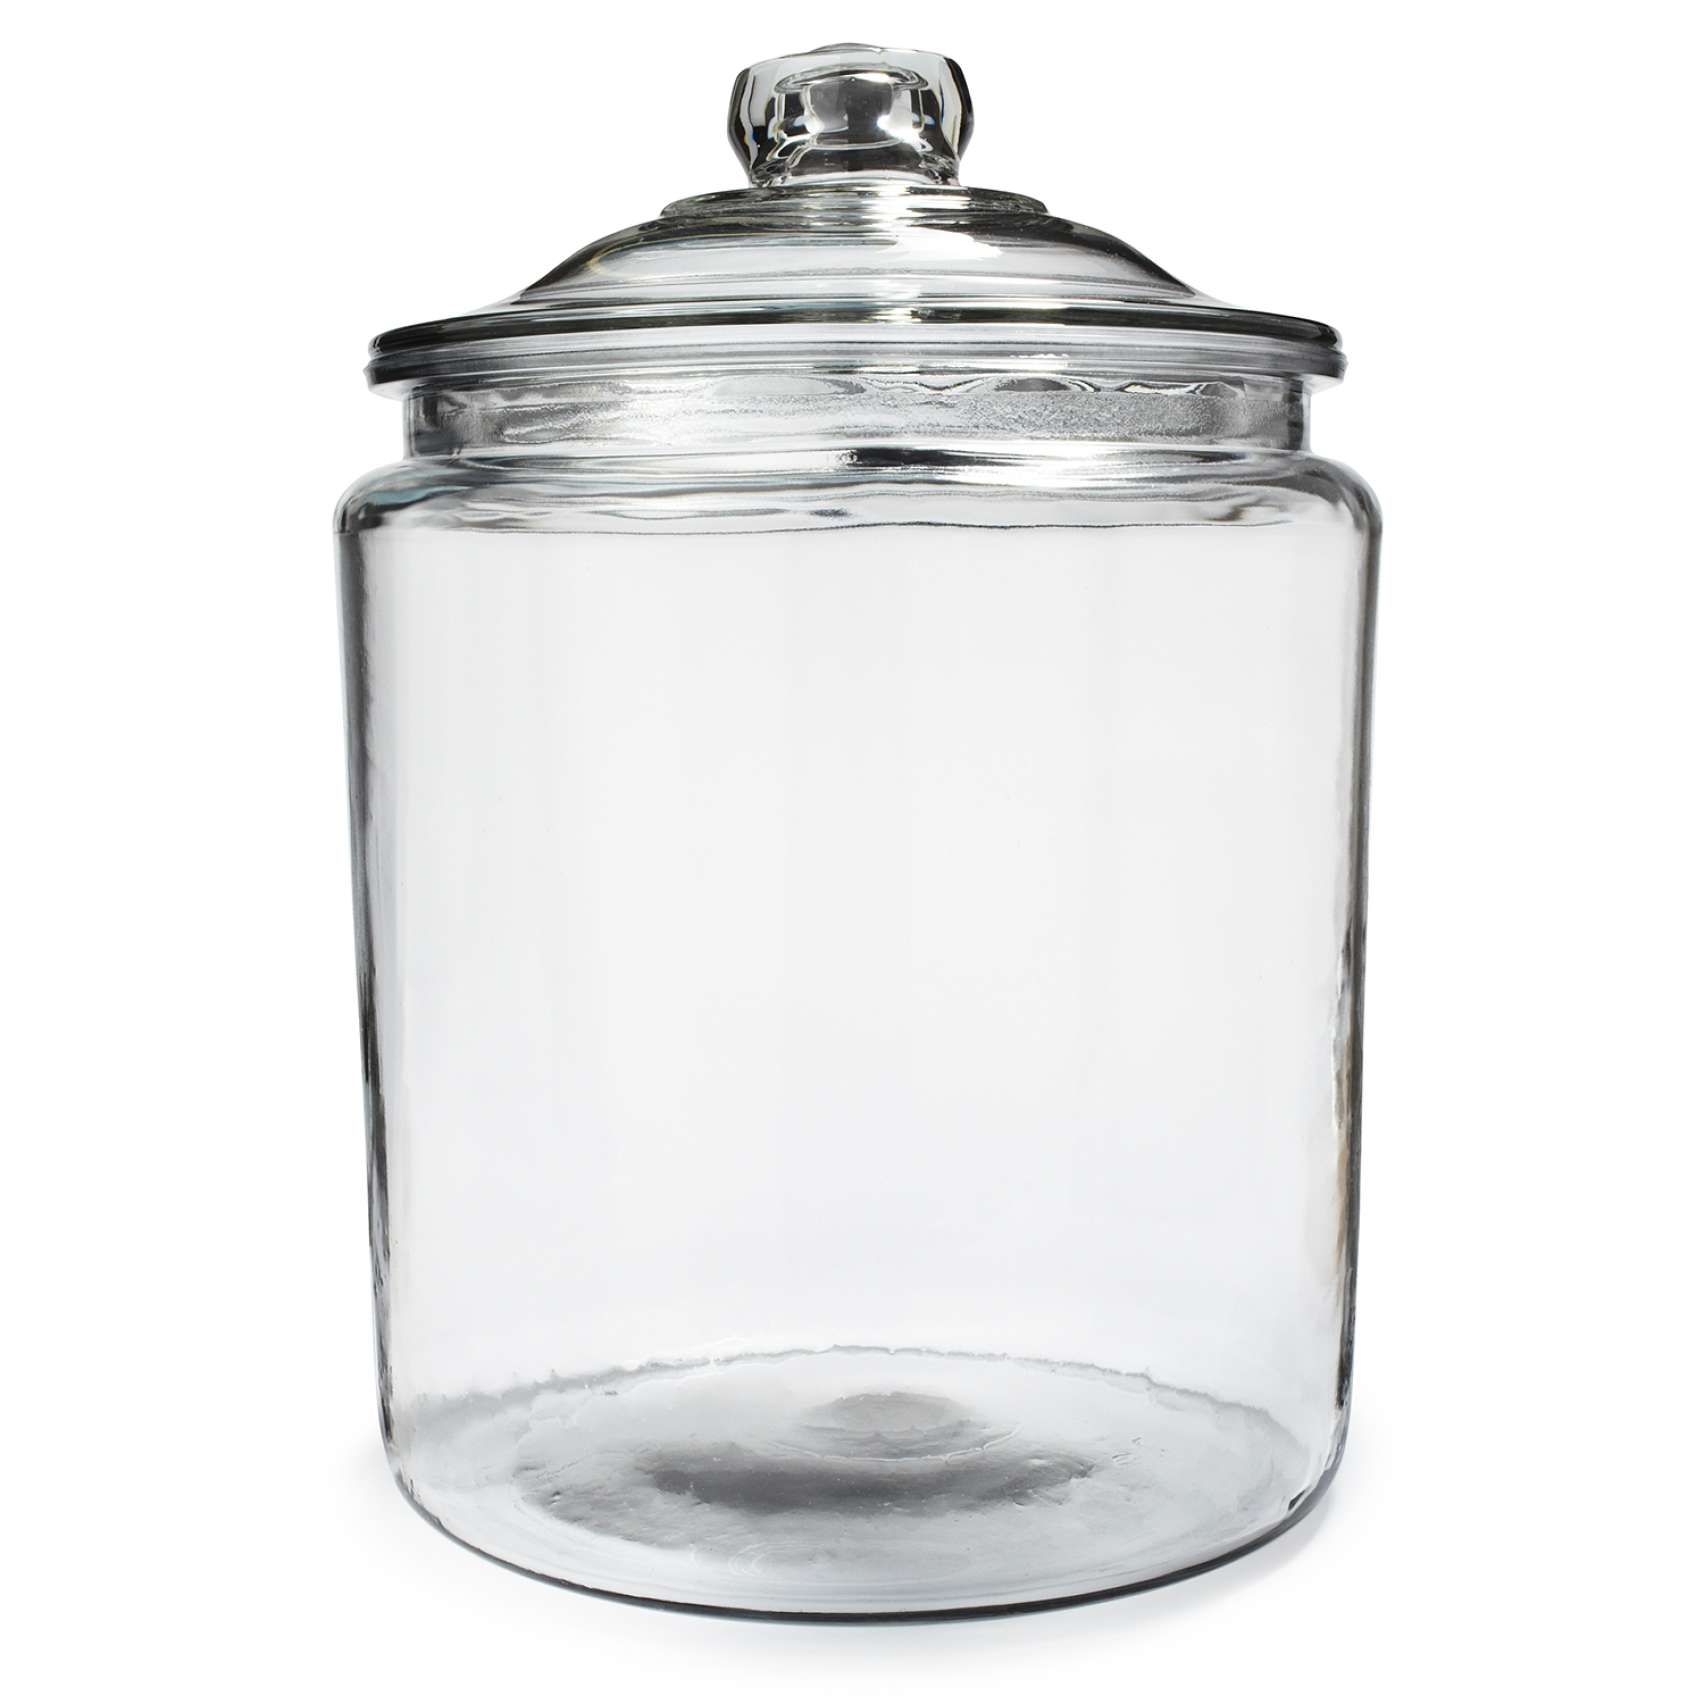 Anchor hocking glass heritage jars flour storage